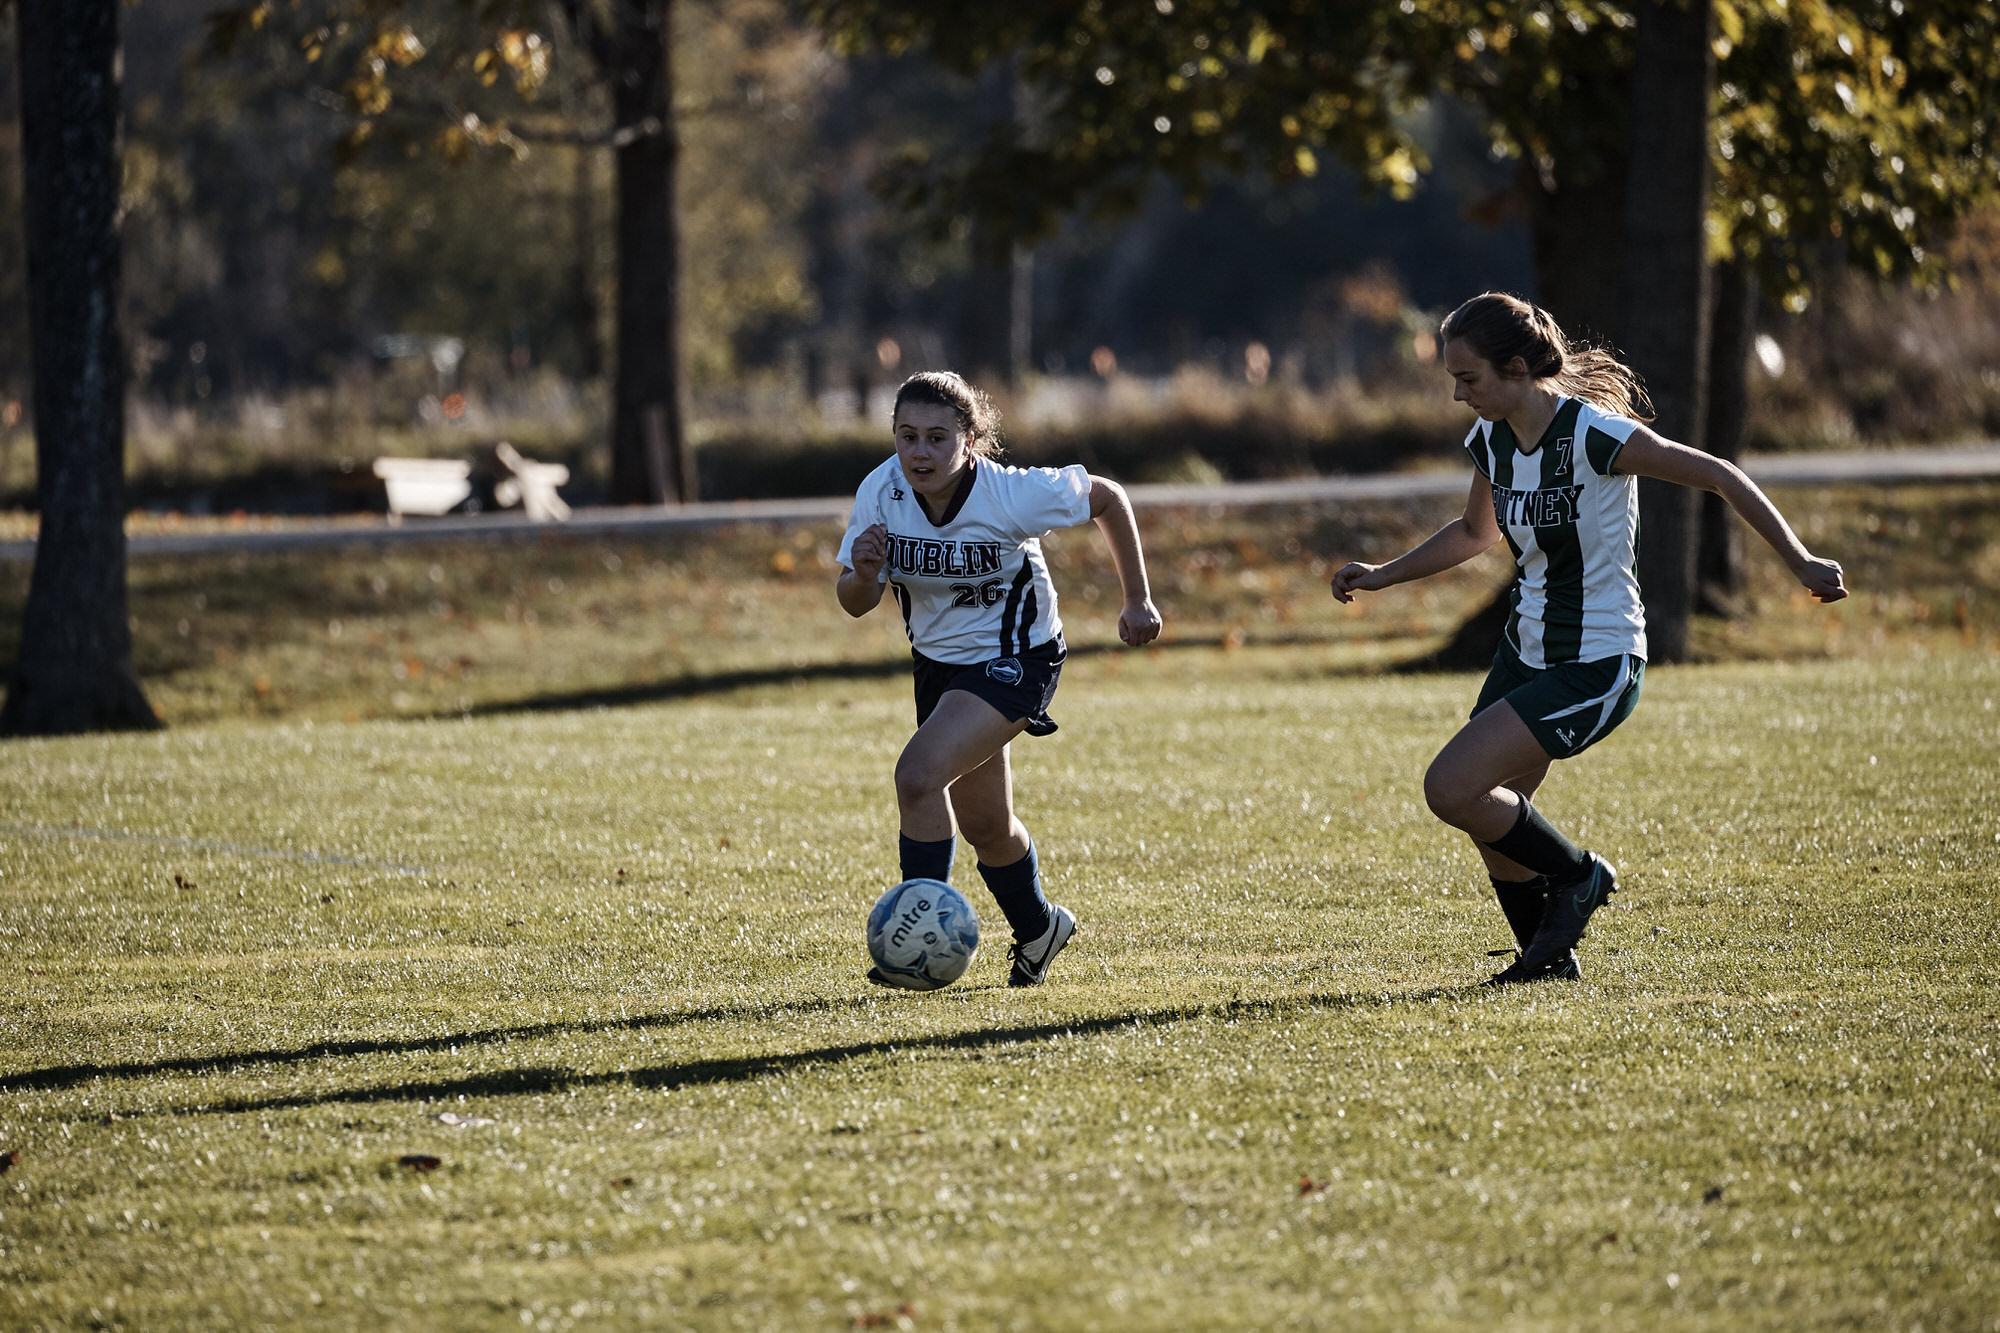 Girls Varsity Soccer vs. Putney School - October 26, 2018 - 029.jpg